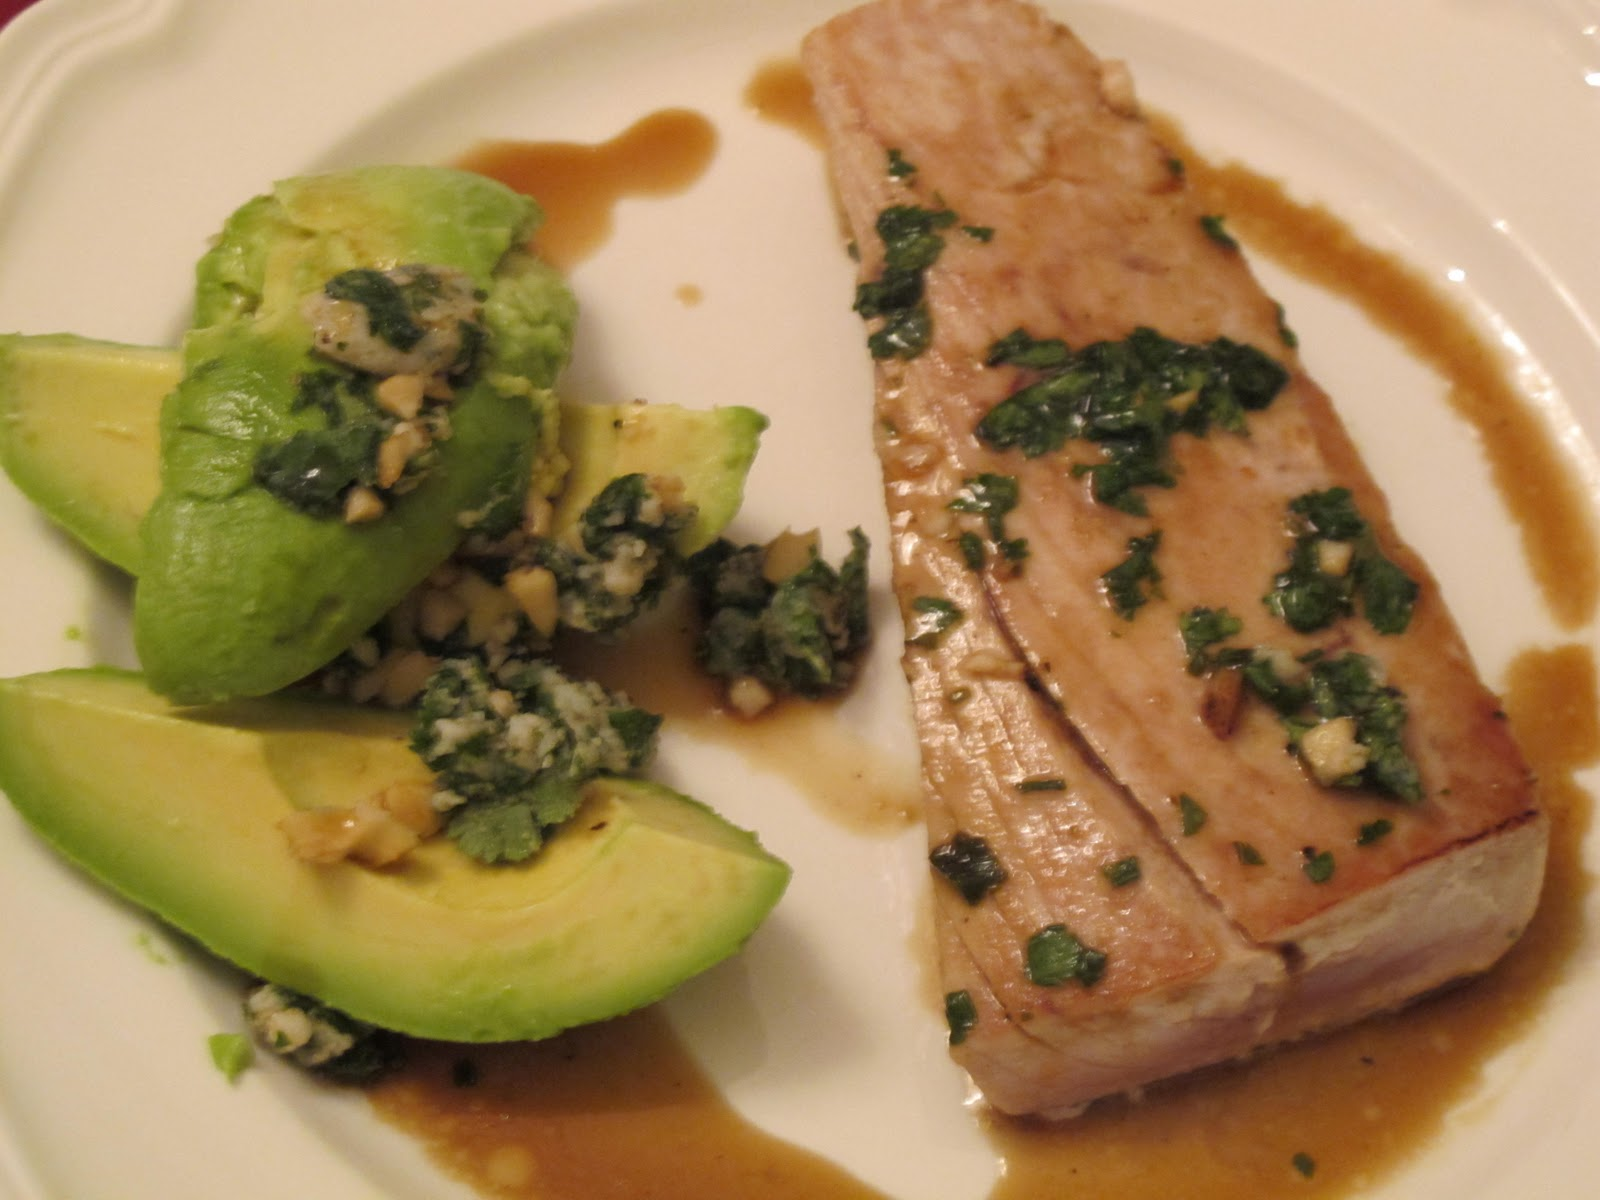 Enjoying Healthy Foods: Pan seared Tuna with Avocado